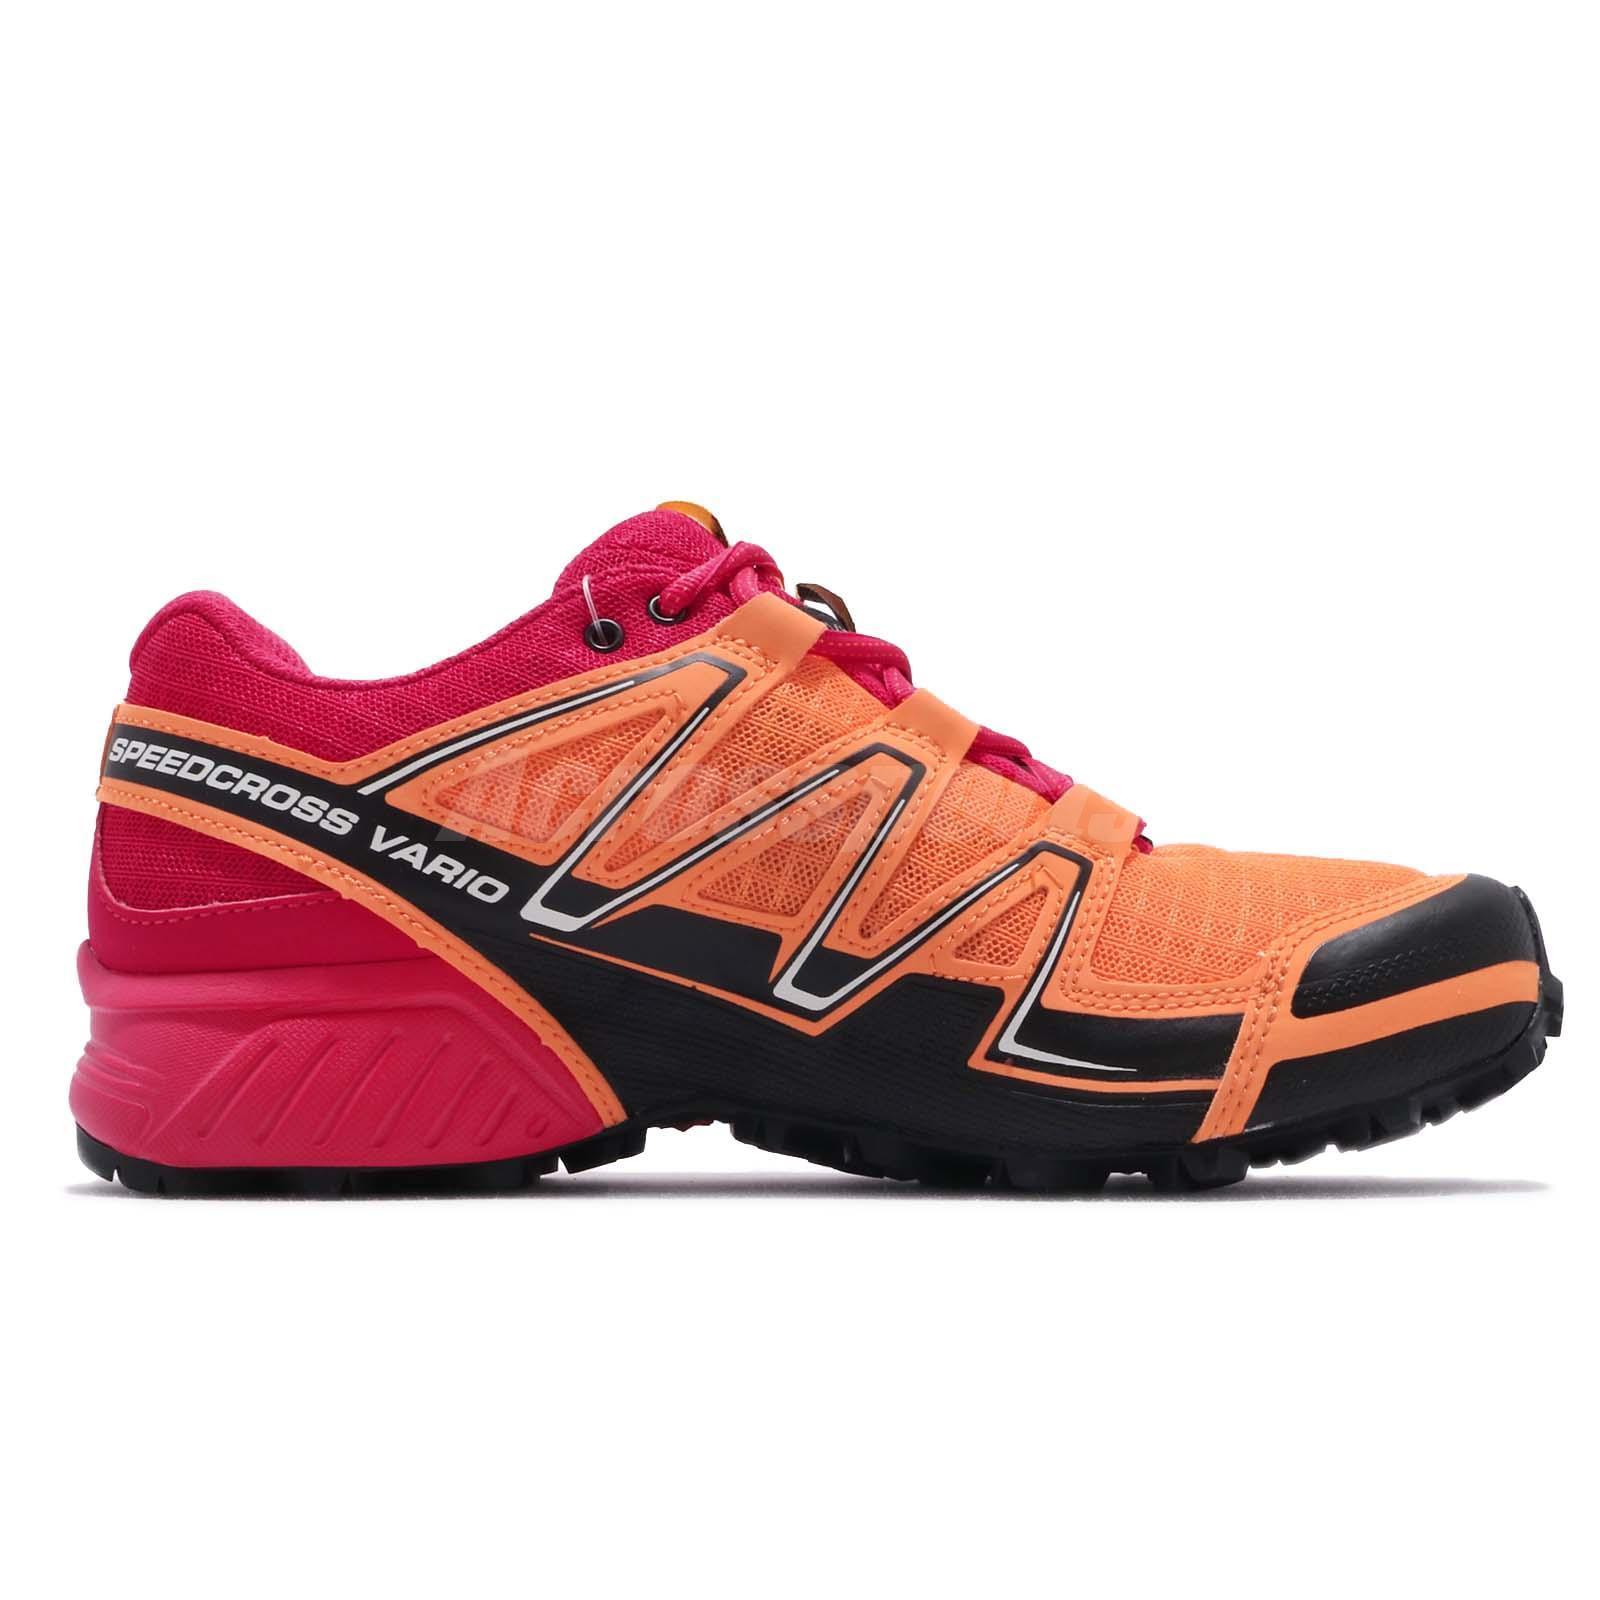 tenis mizuno feminino wave 02 07 uruguay jack shoes